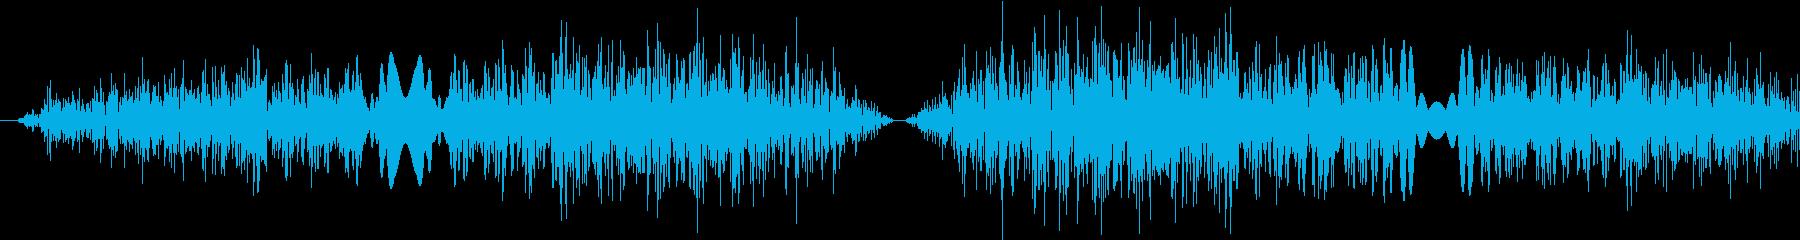 DJプレイ スクラッチ・ノイズ 4の再生済みの波形